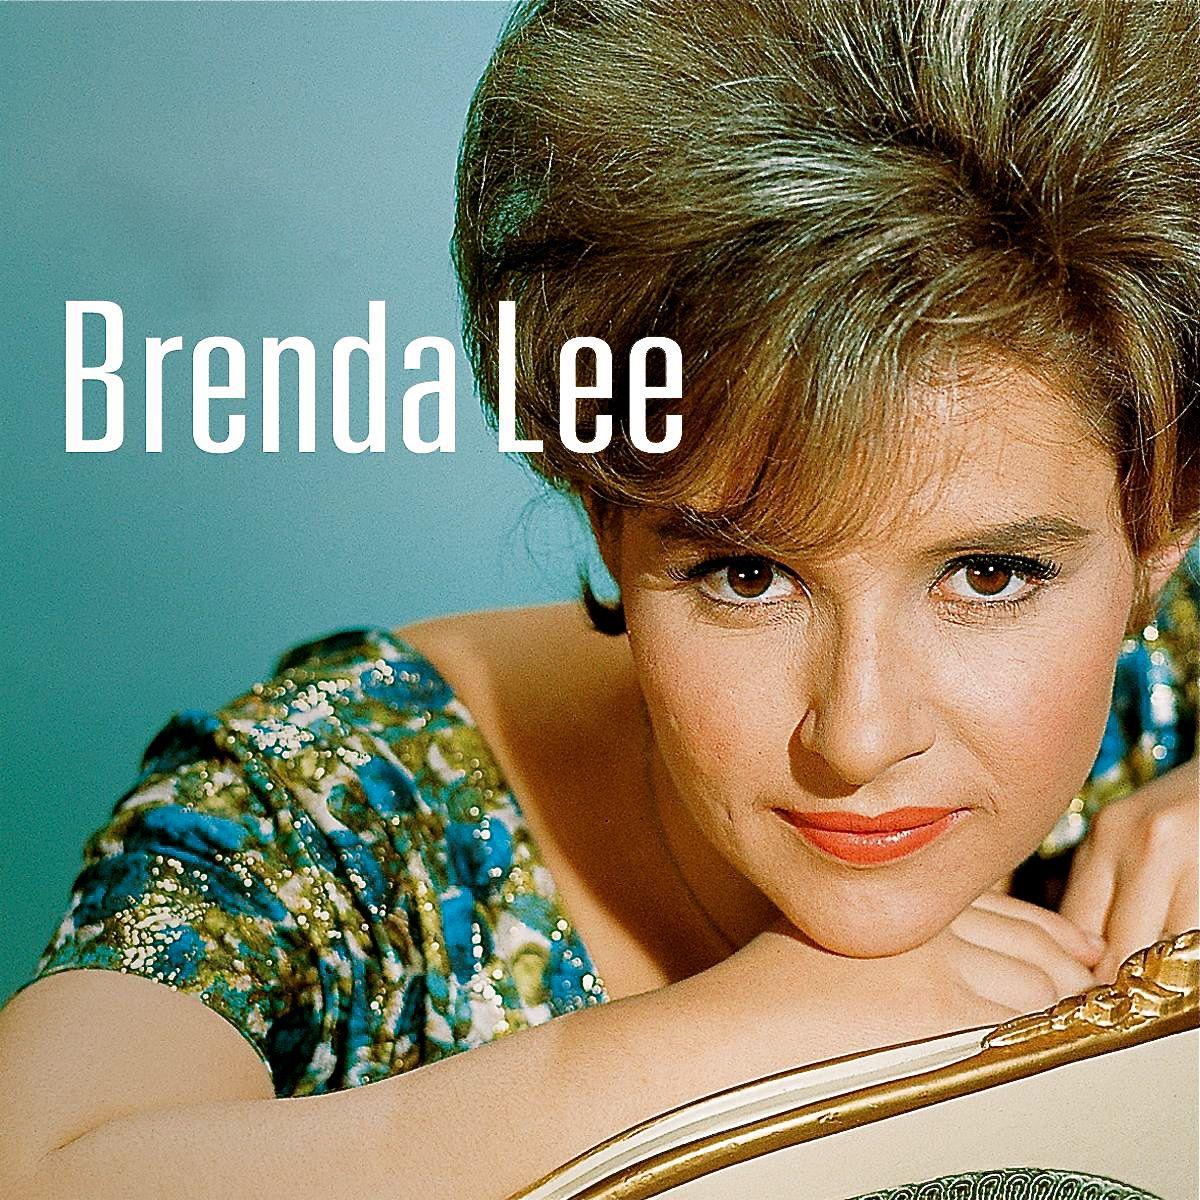 Brenda Lee Music 1960 S Pinterest Brenda Lee And